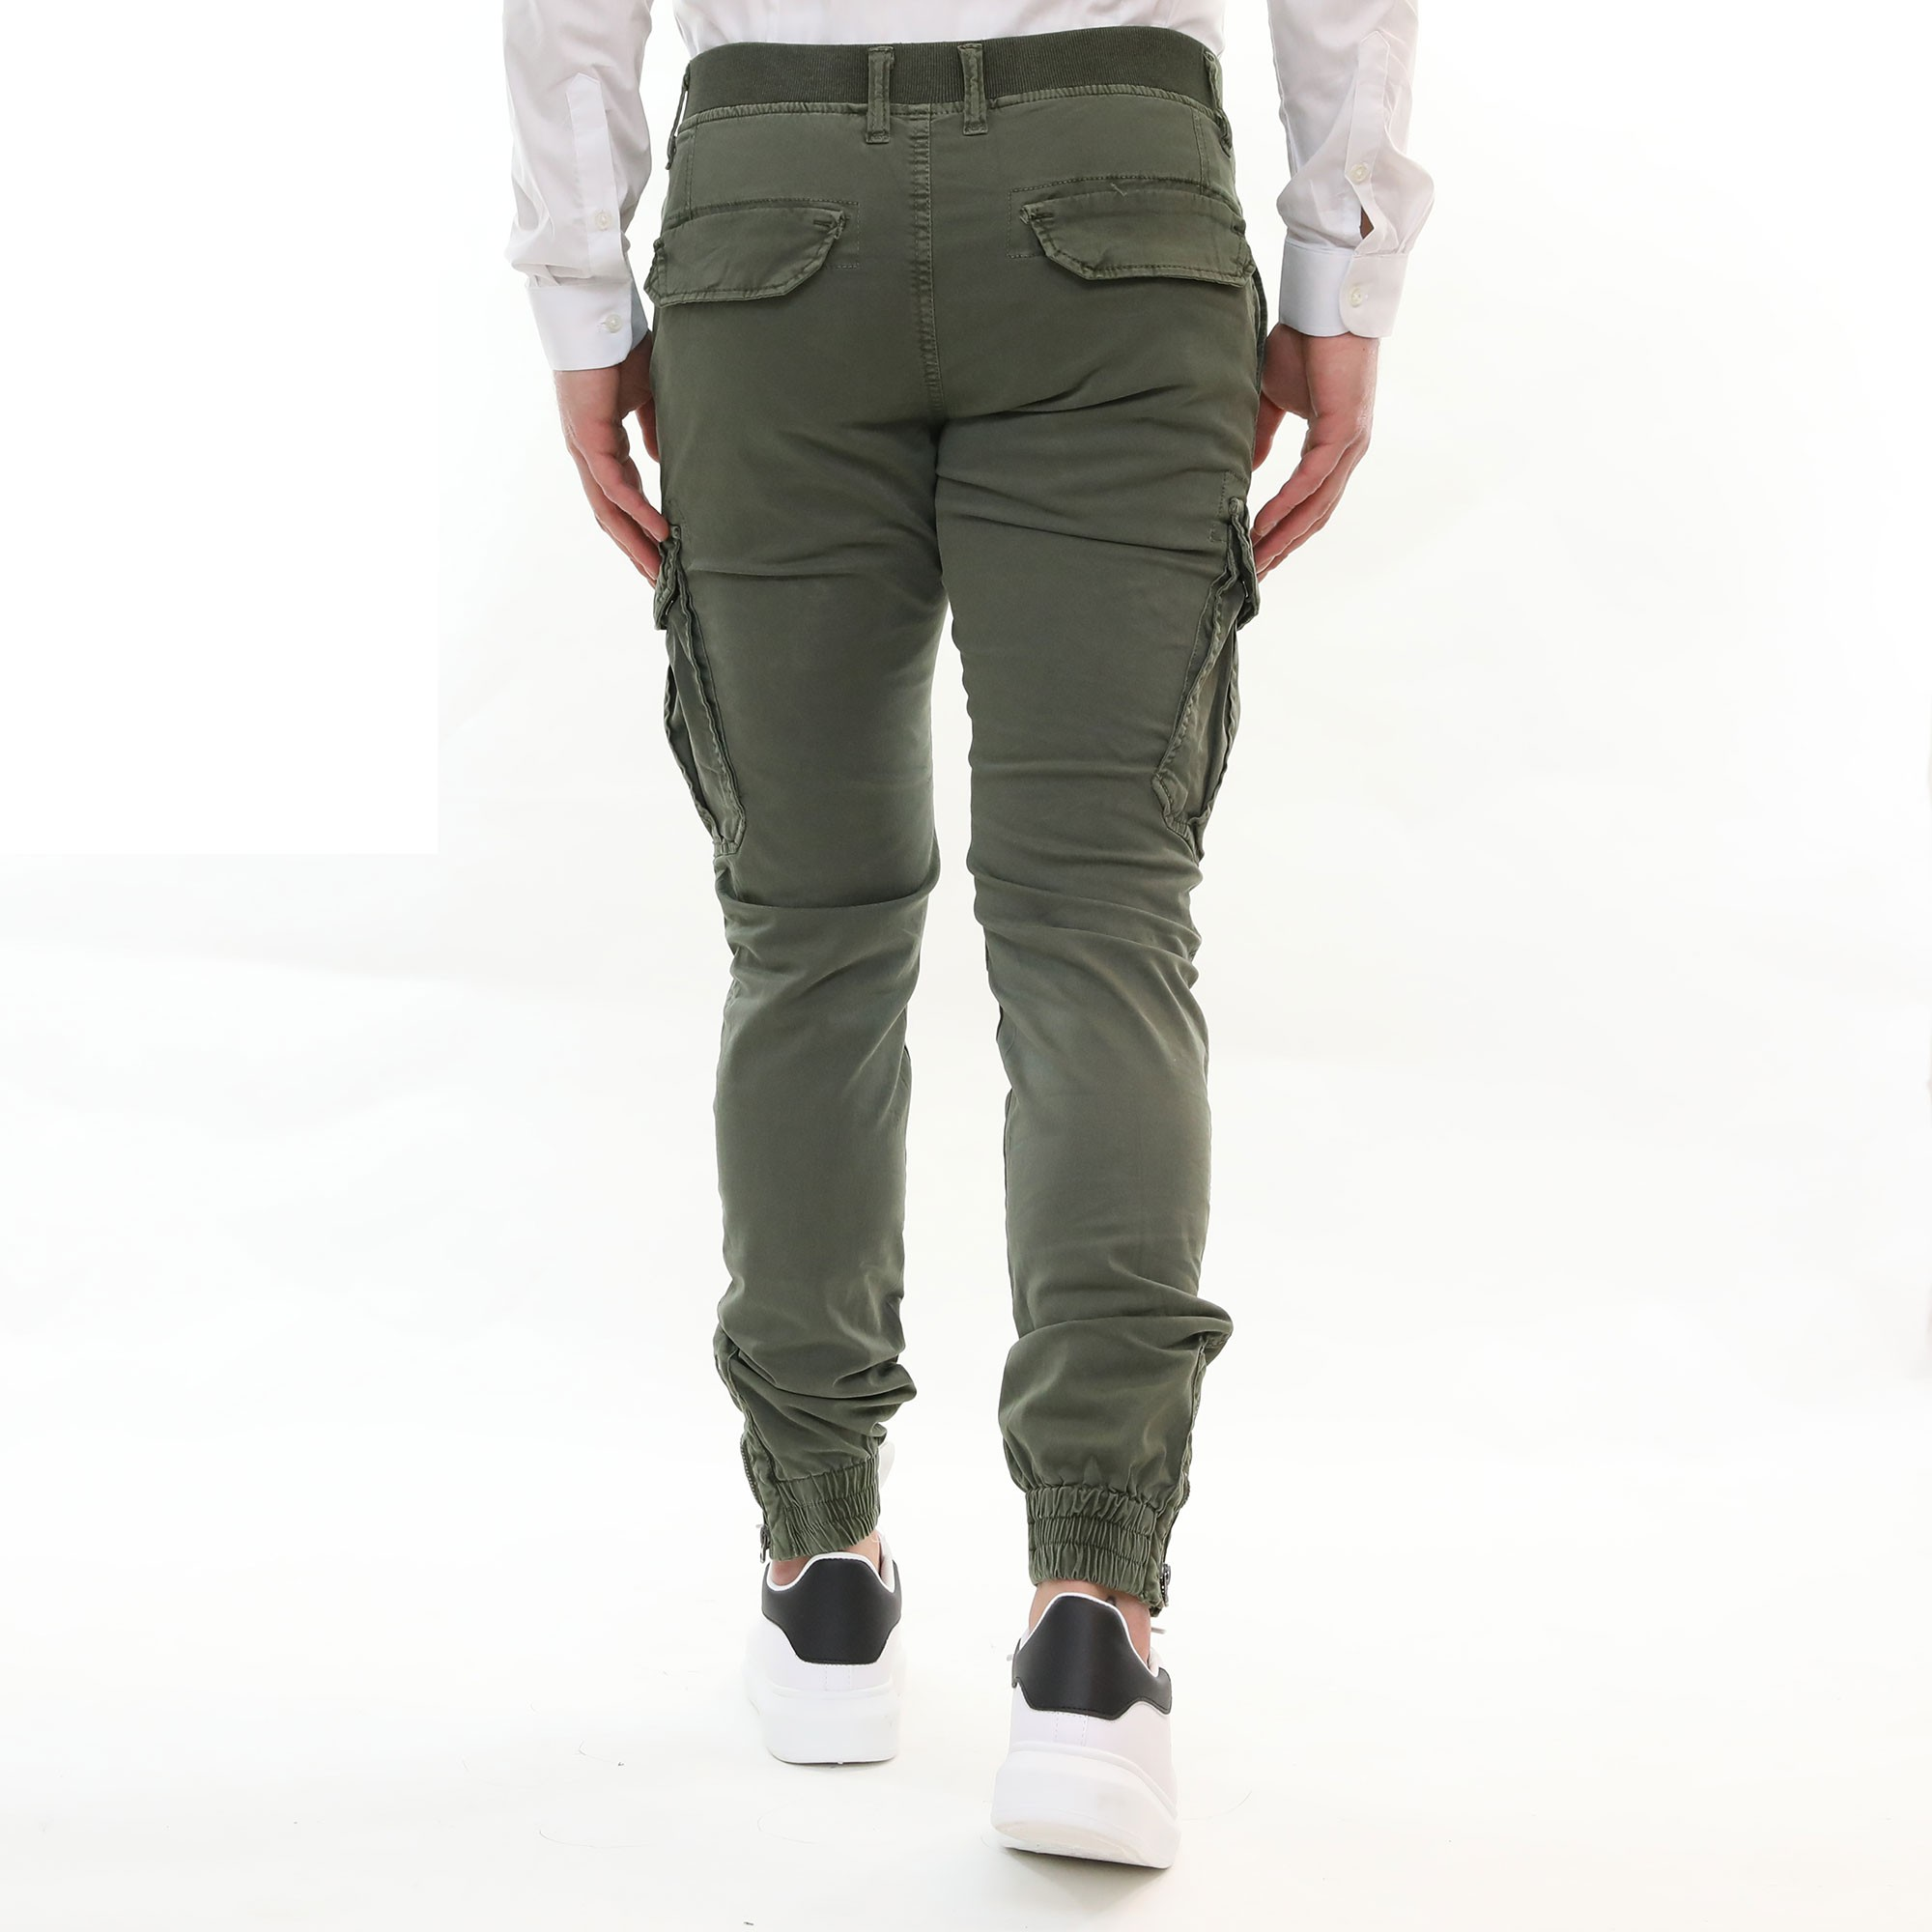 Pantalone-Uomo-Cargo-Primaverile-Con-Tasconi-Verde-Blu-Beige-SlimFit-Pantaloni miniatura 7